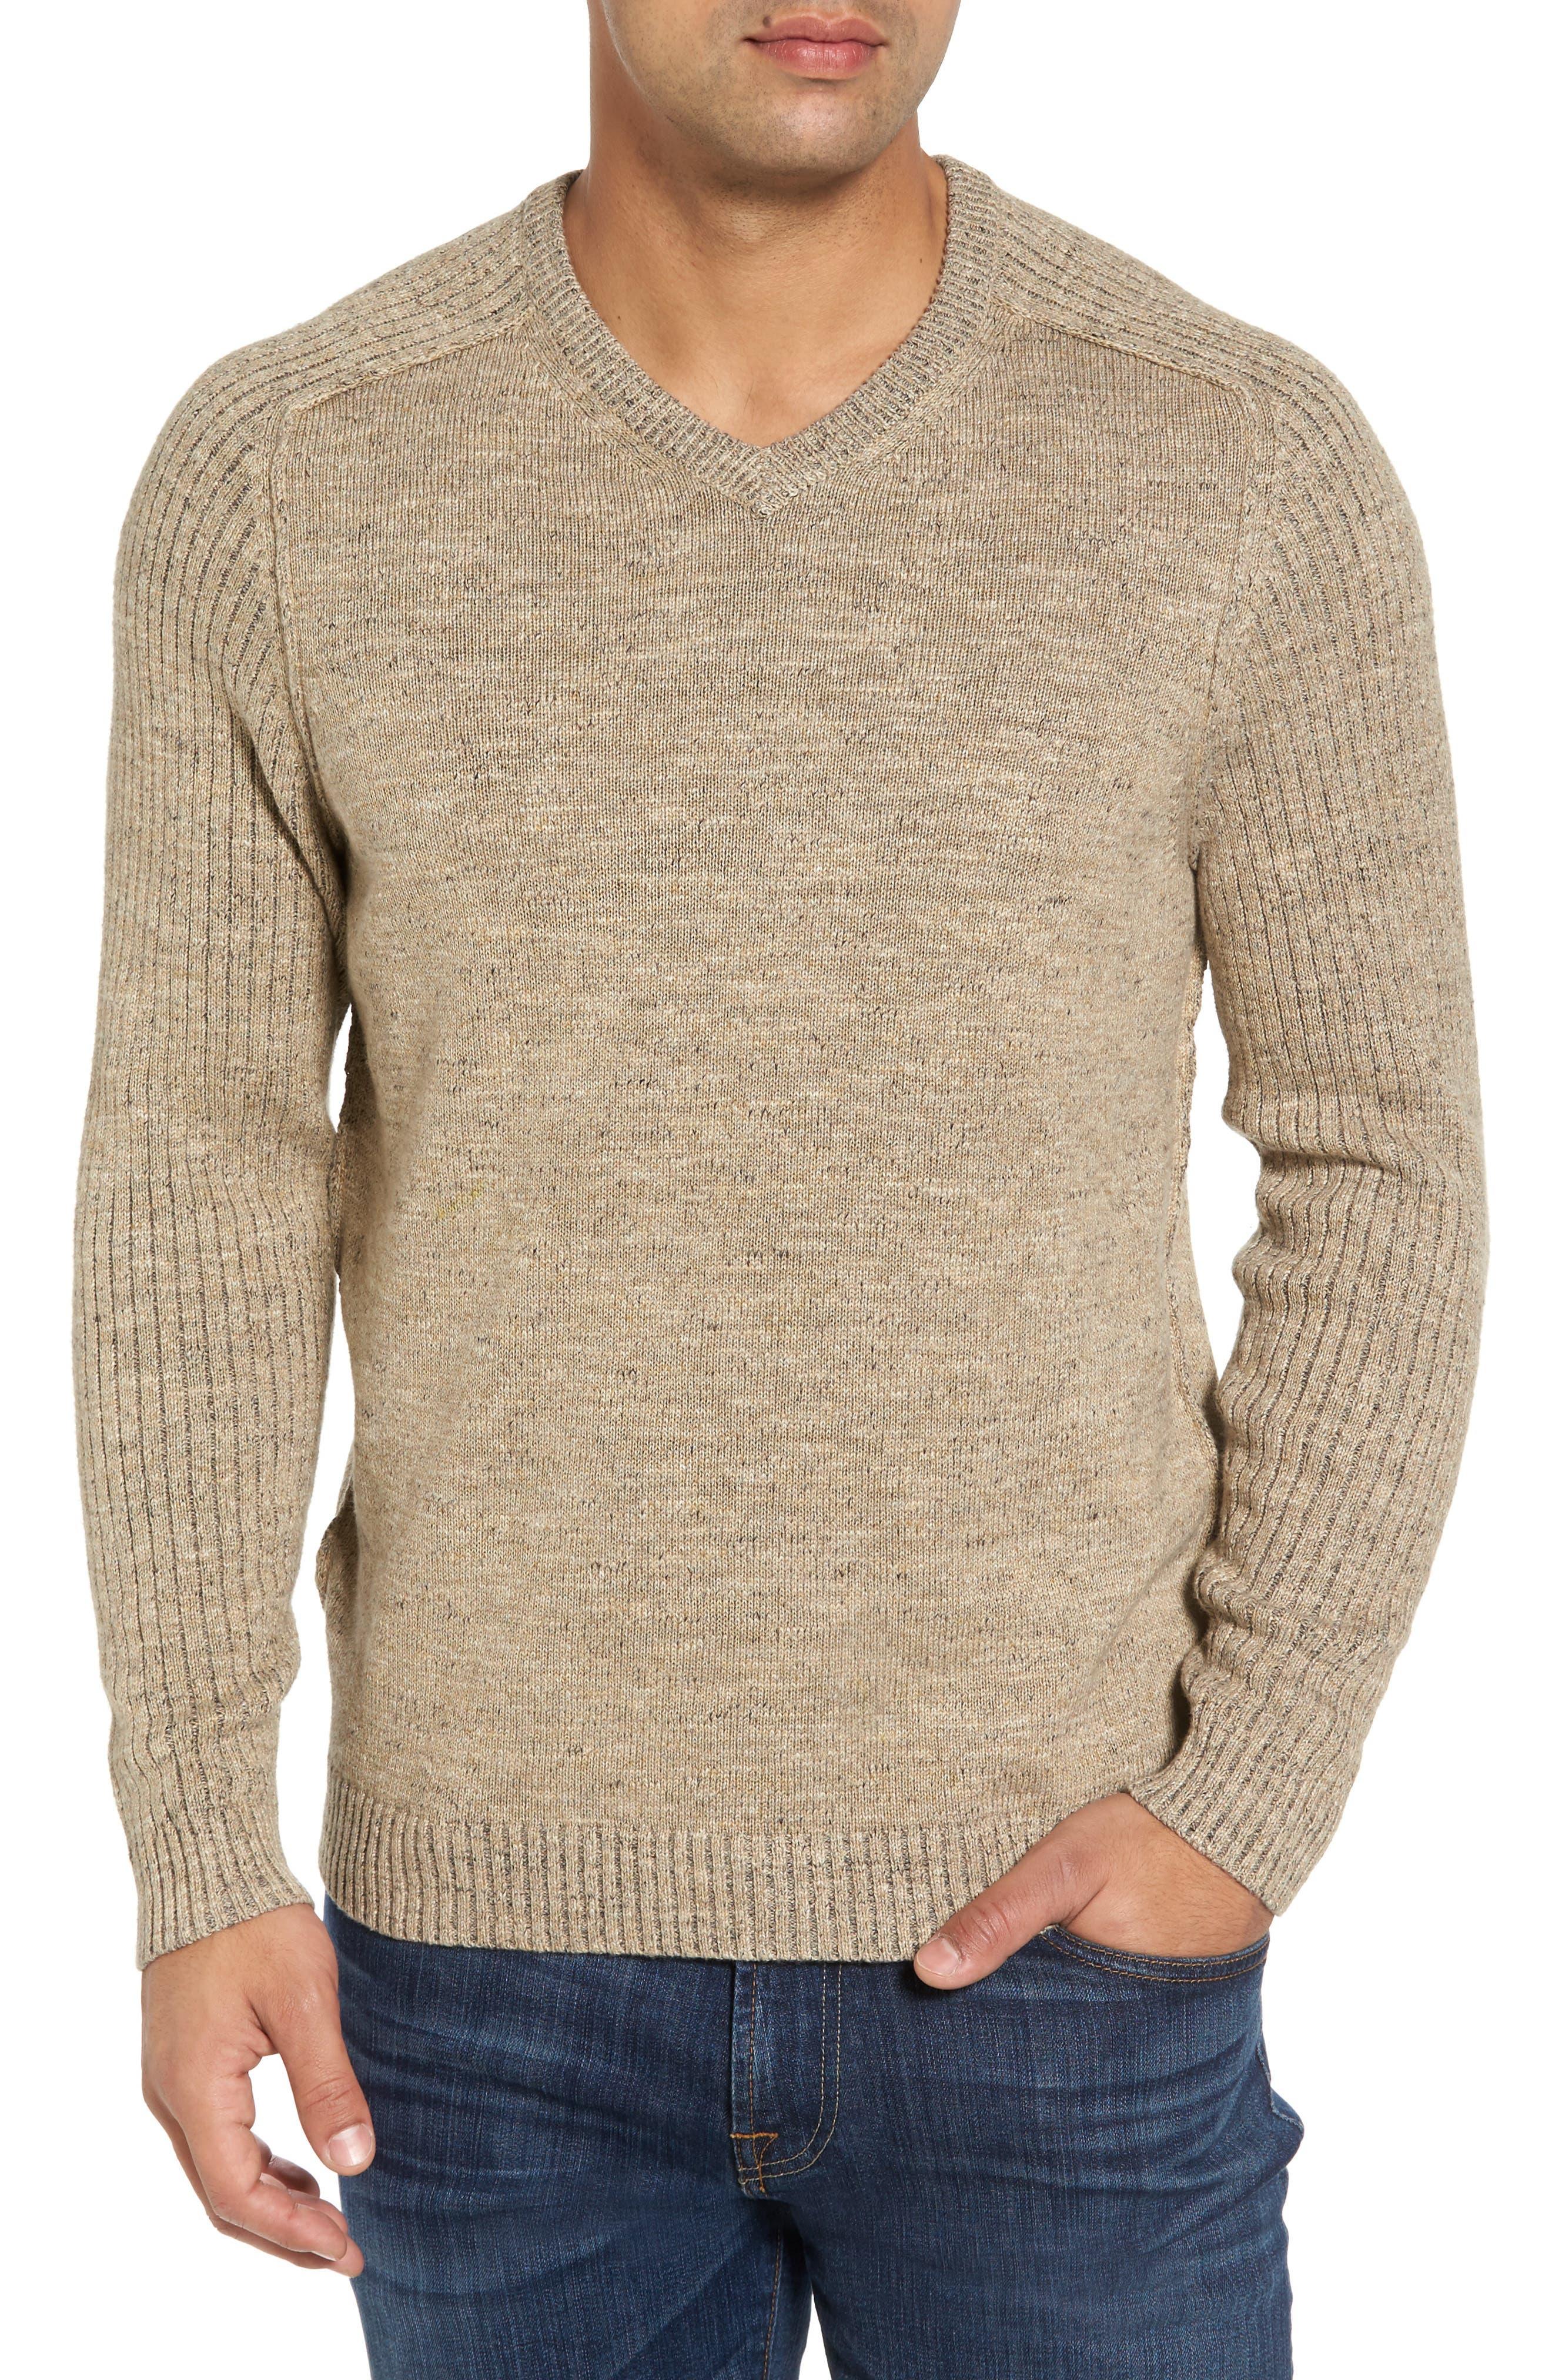 Main Image - Tommy Bahama Gran Rey Flip Reversible Cotton & Wool Sweater